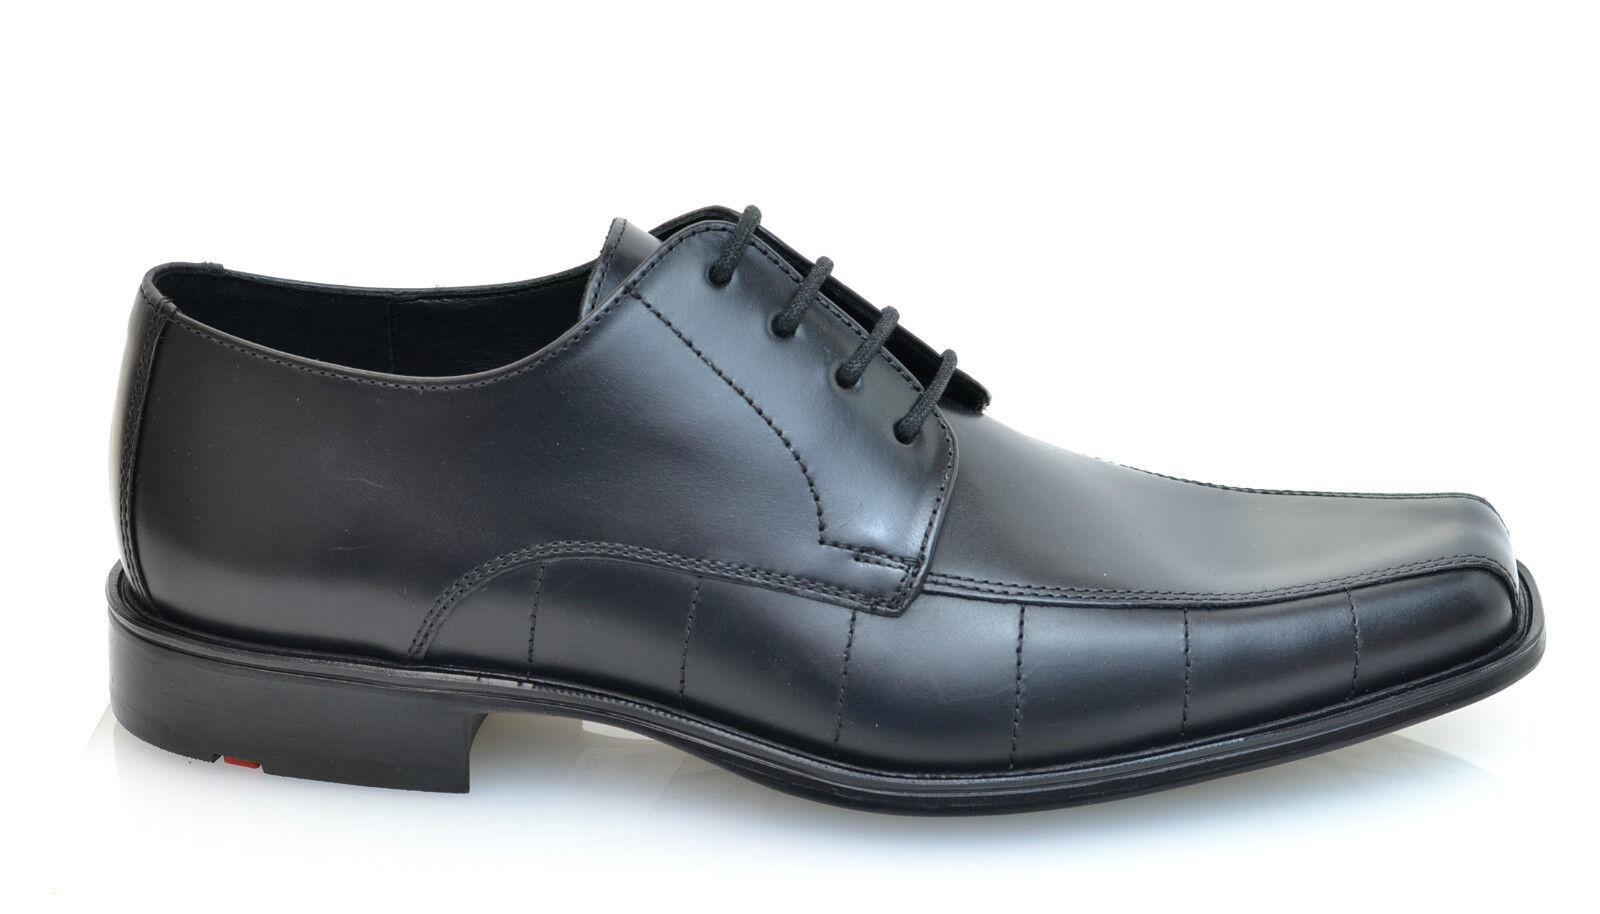 Lloyd shoes schwarz Leder Anzug Schuhe NEU REDUZIERT + Schuhcreme gratis